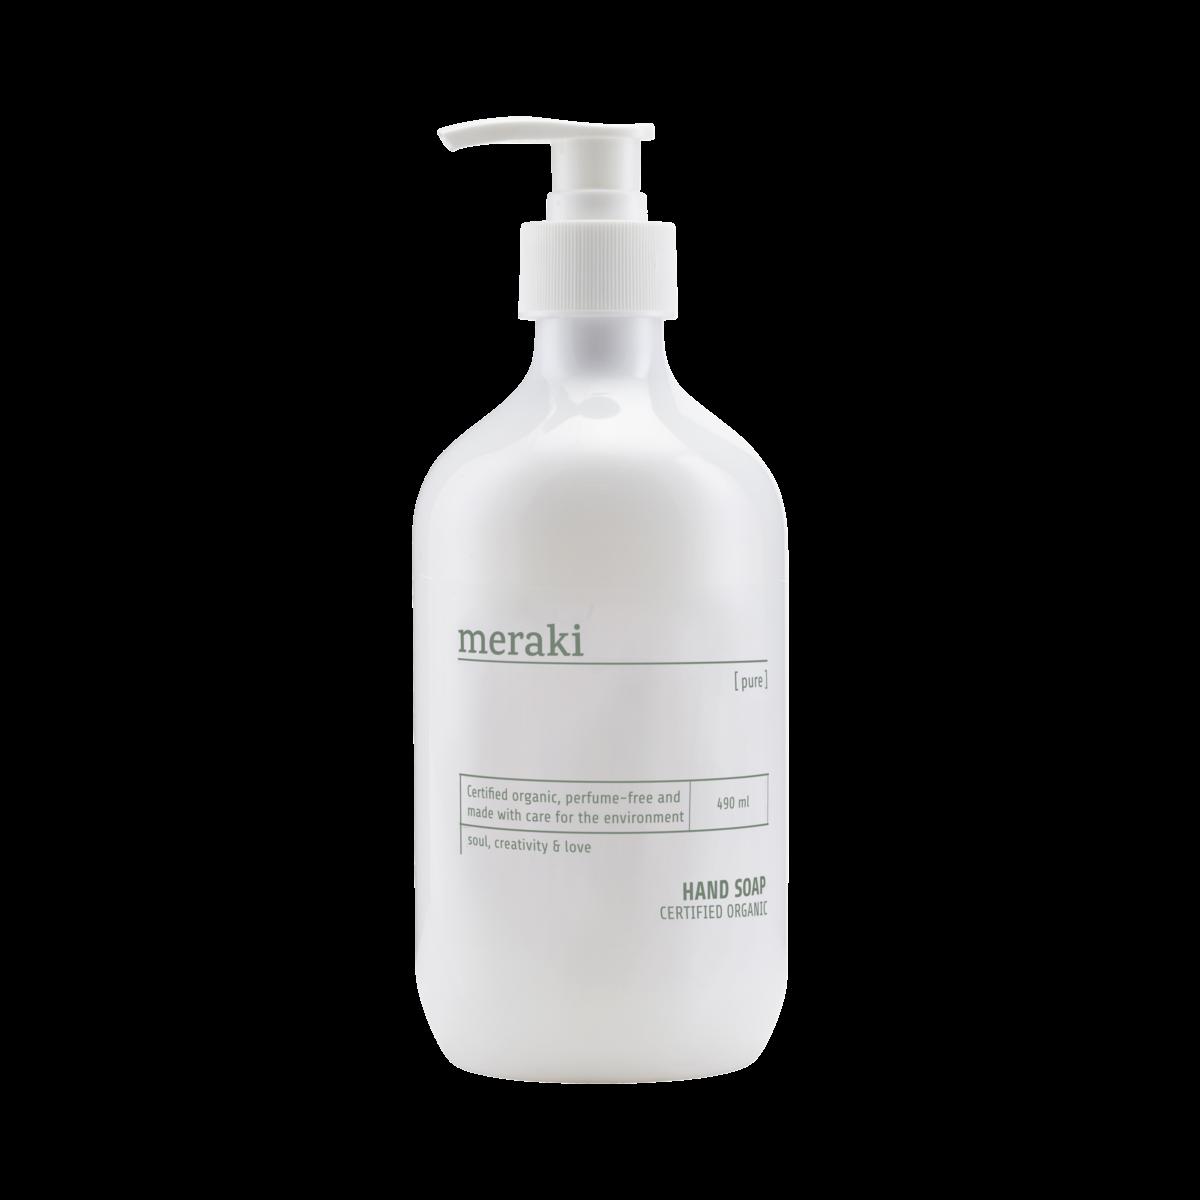 Meraki - Pure Hand Soap 450 ml (Mkas96/309770096)